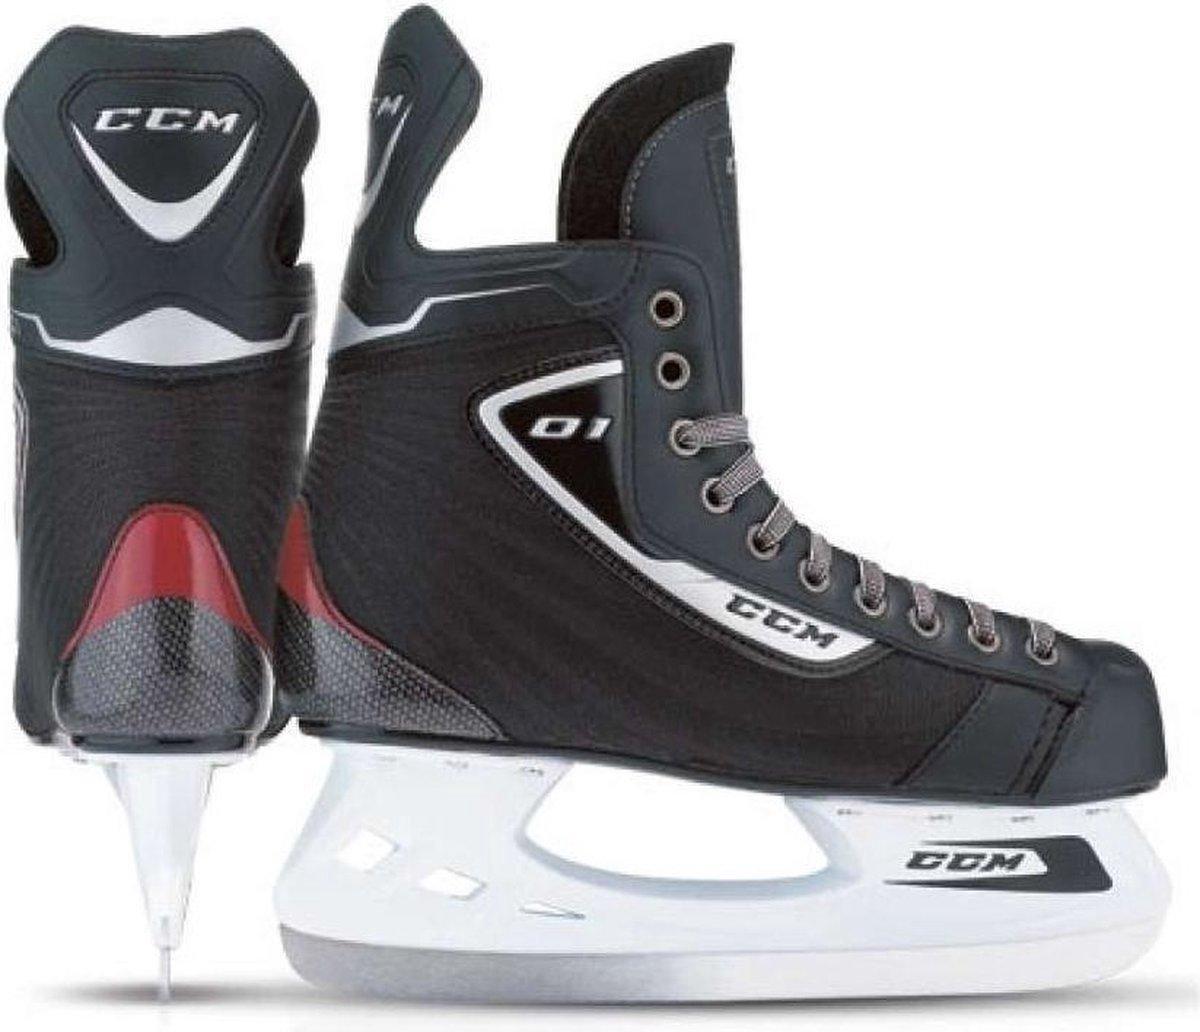 CCM Hockey Skates - SK U +01 - Zwart - Maat 40